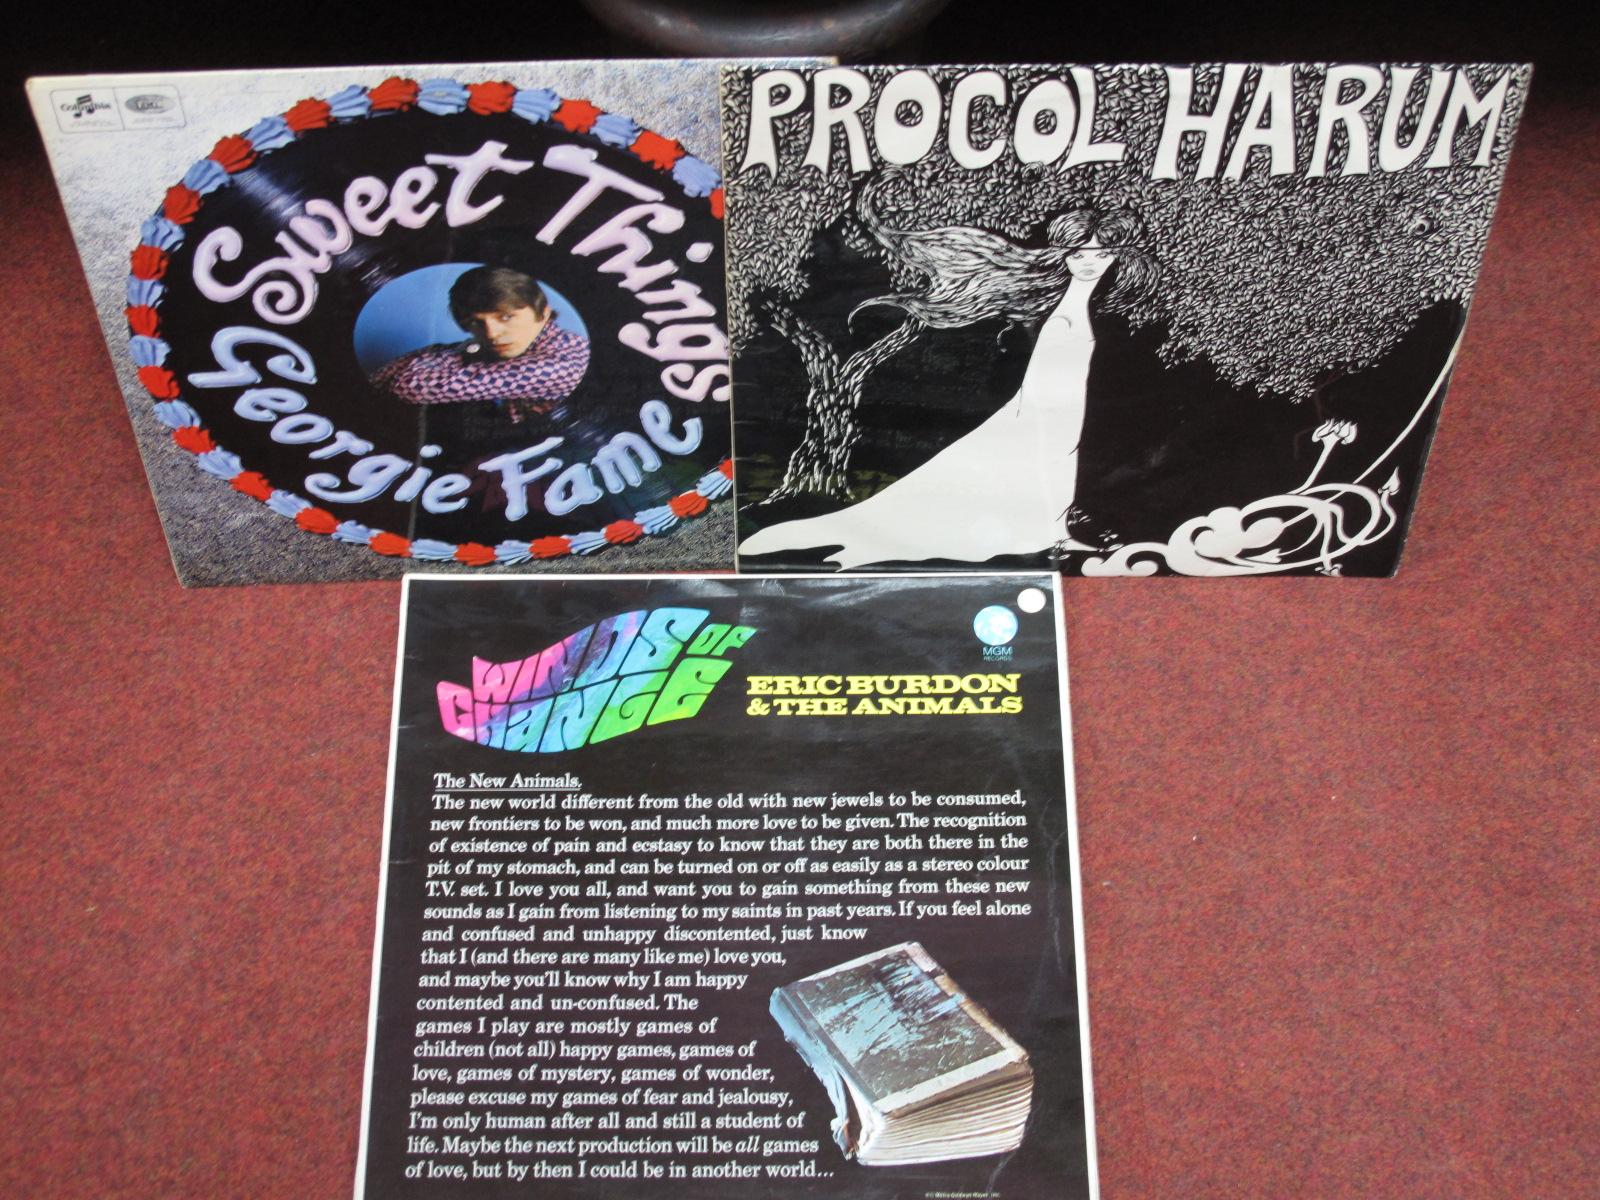 Lot 623 - Procol Harum '1st' LP, 1967, blue Regal Zonophone, Mono LRZ 1001, -2/-2 matrix, Garrod & Lofthouse